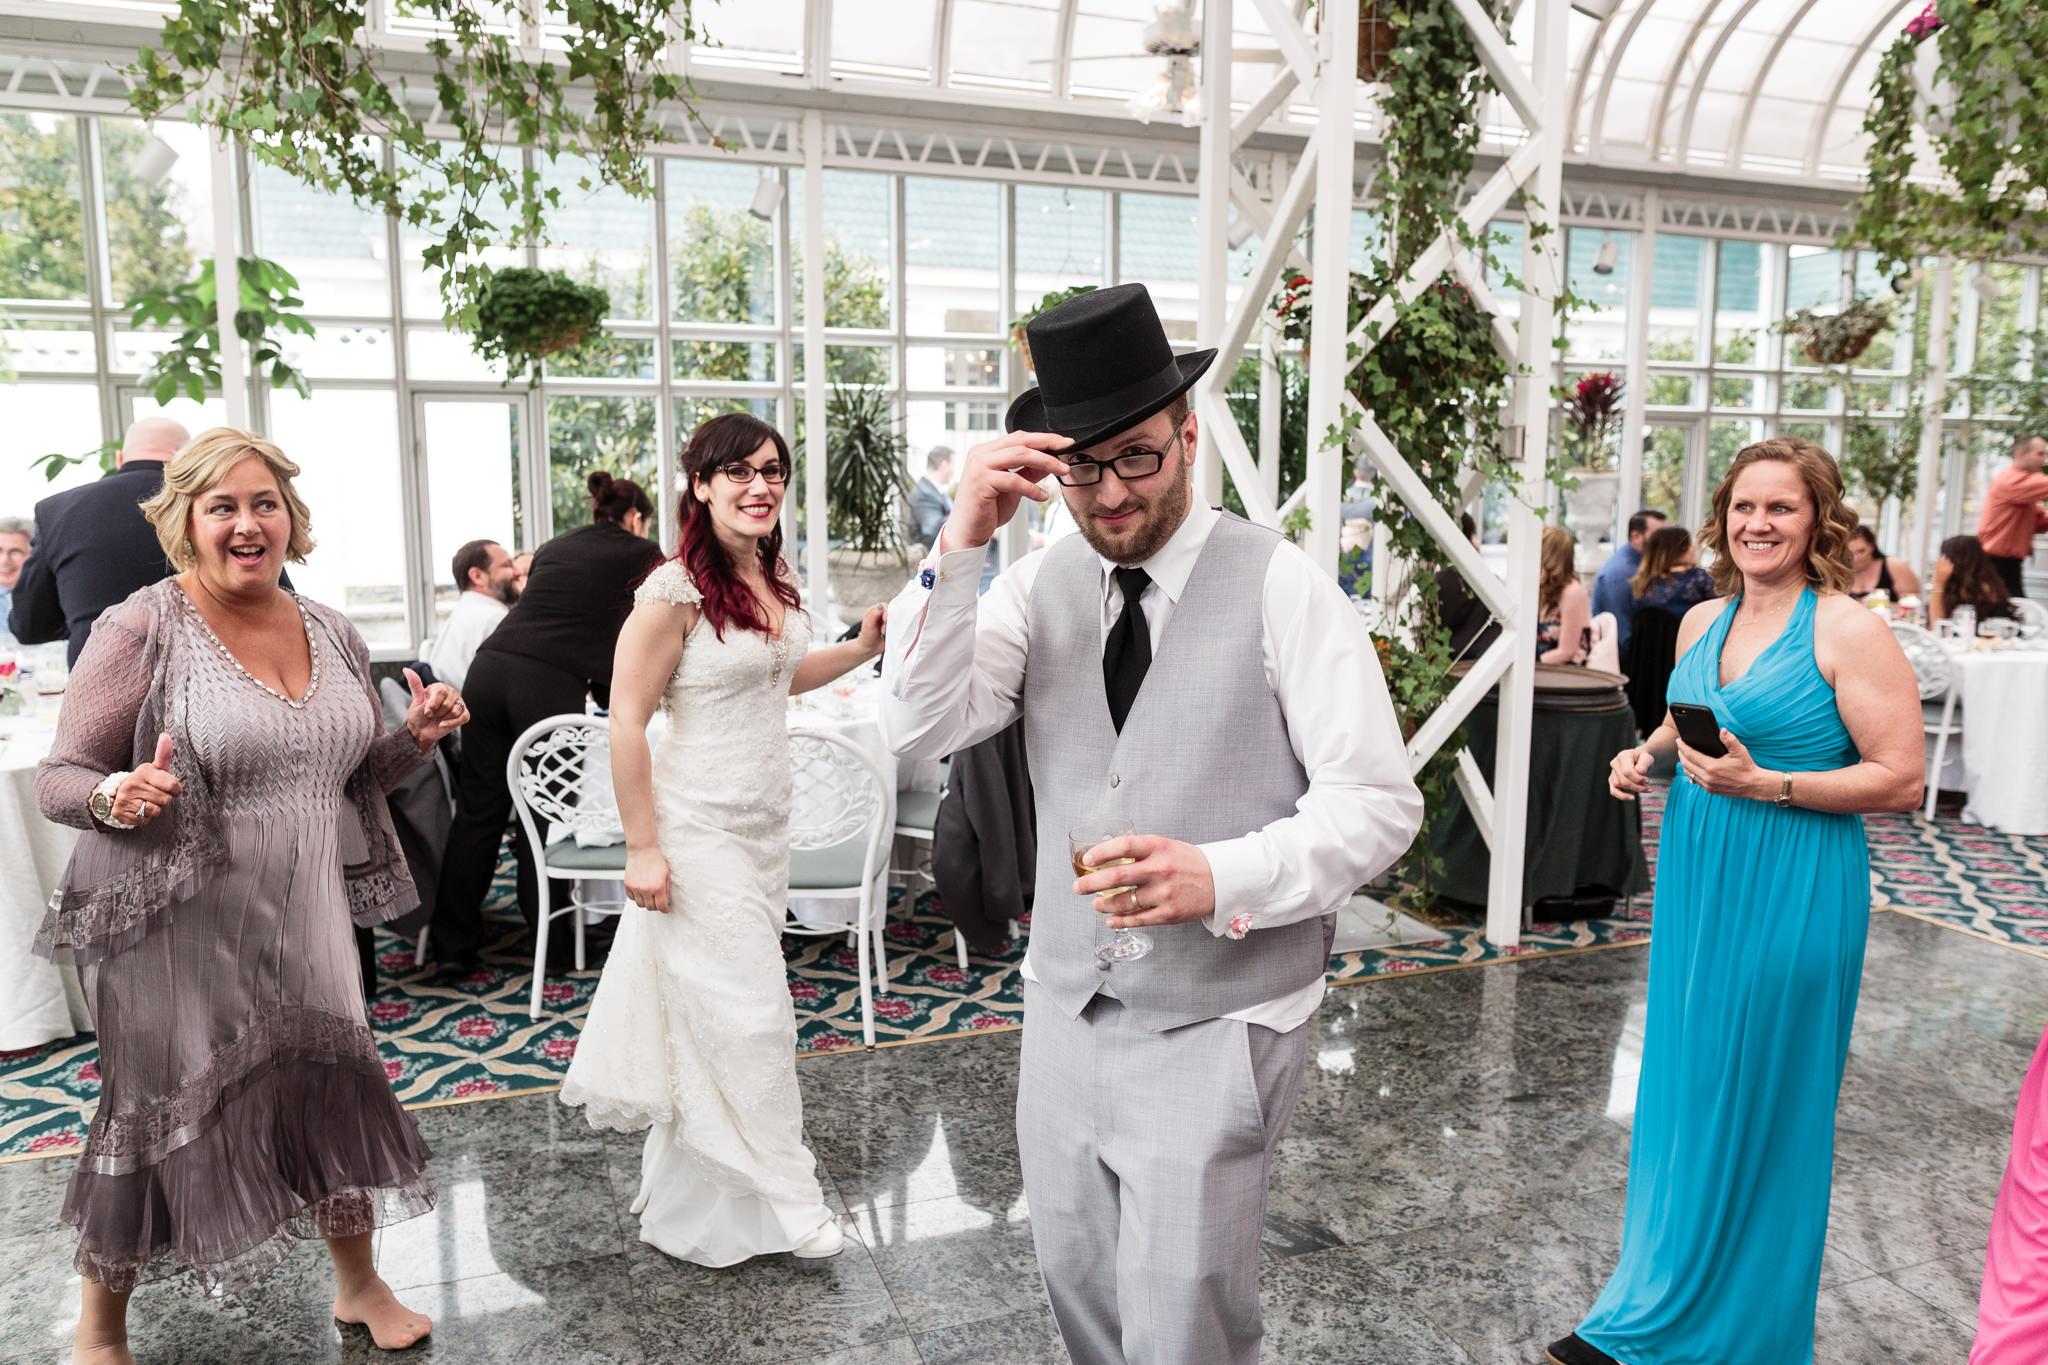 Hanchar_Madison_Hotel_NJ_Wedding_2C0A8306.jpg